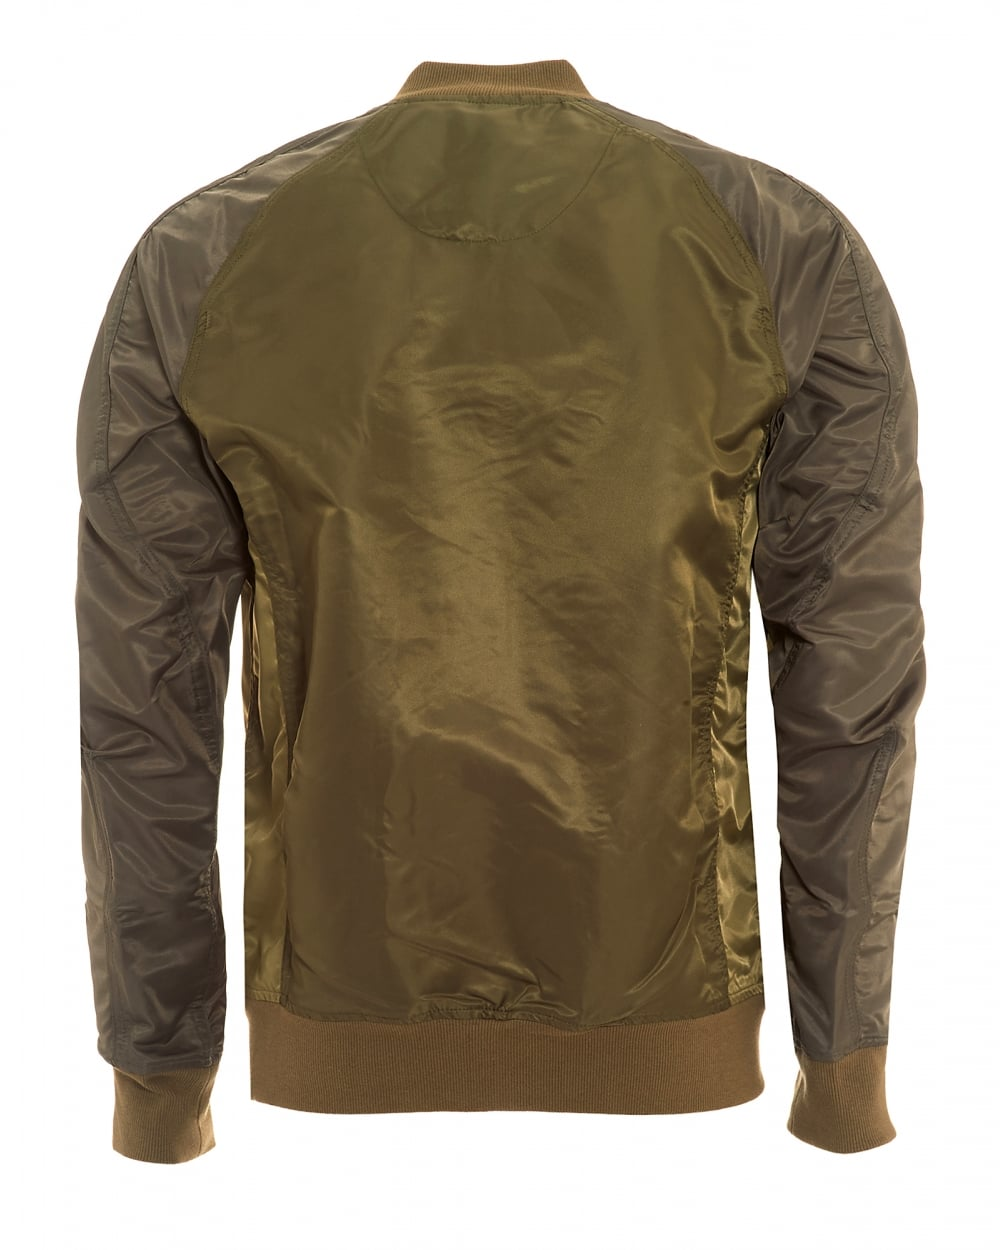 Maharishi mens ergonomic ma olive green bomber jacket mens ergonomic ma olive green bomber jacket gumiabroncs Image collections